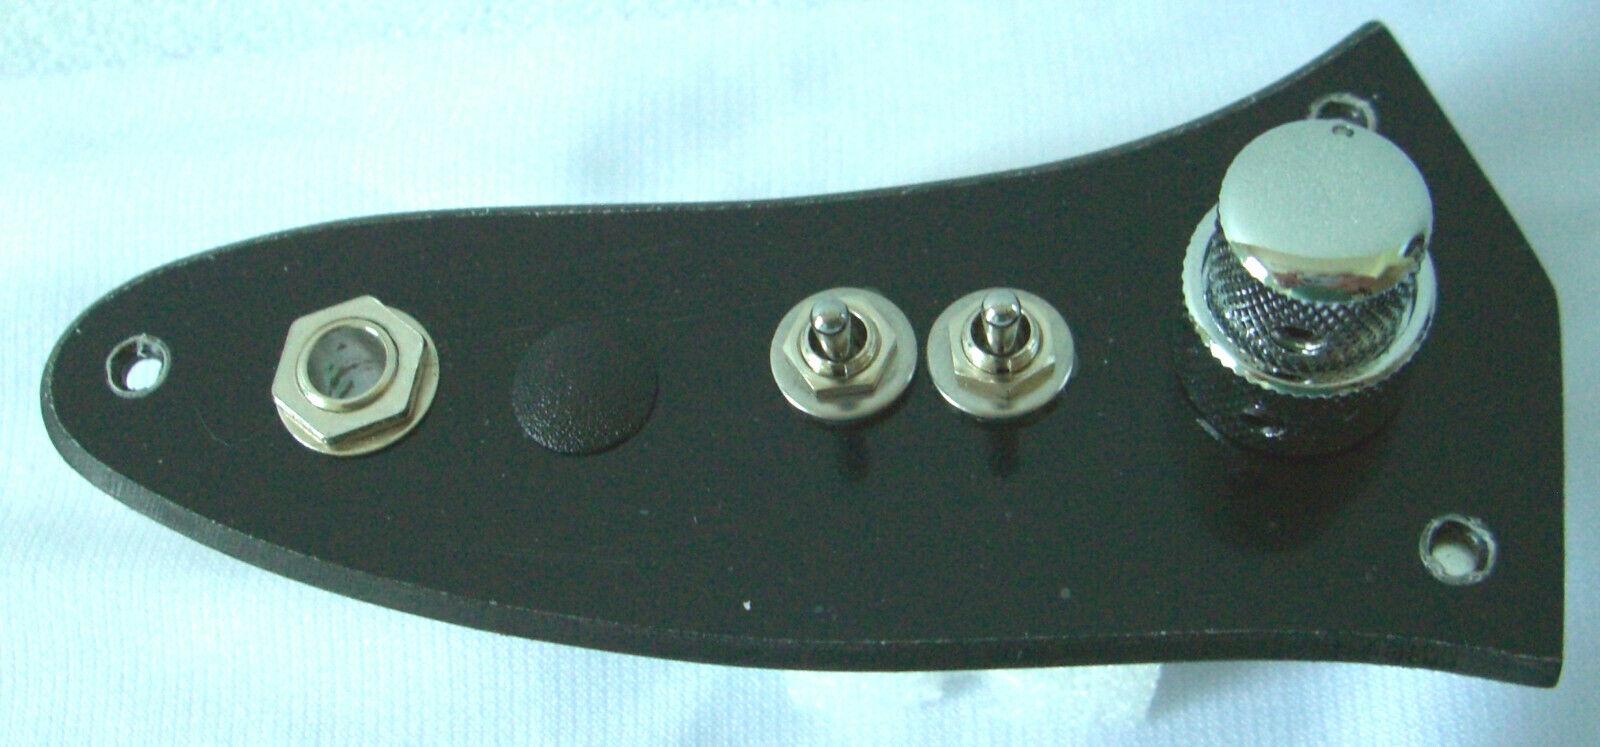 Get 4 Pickup Tones New AMI Upgrade Fits JMJ Road Worn Mustang Bass EZ-Install